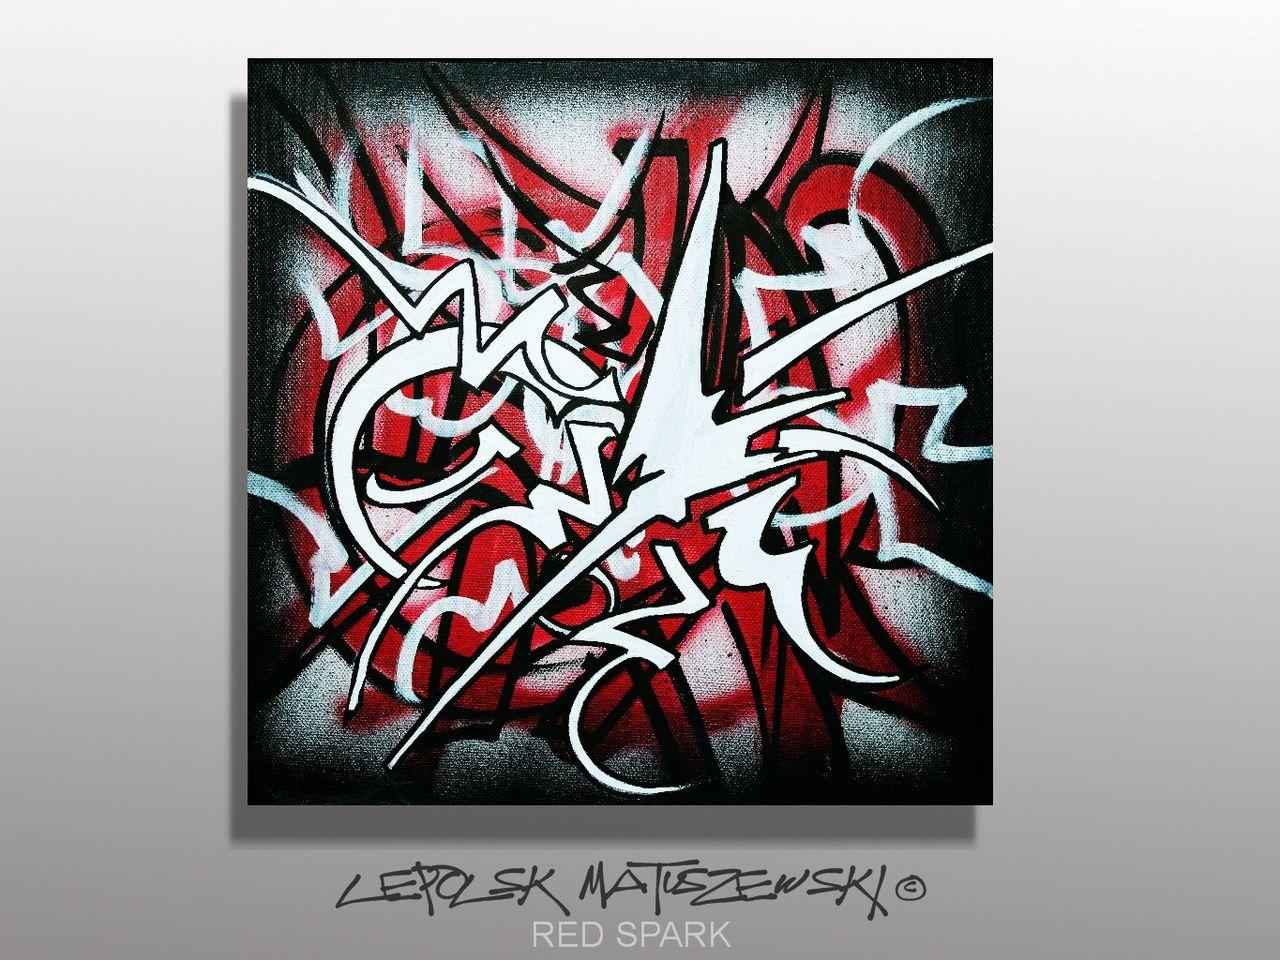 MK  Lepolsk Matuszewski RED SPARK  street art calligraffiti graffiti abstrait